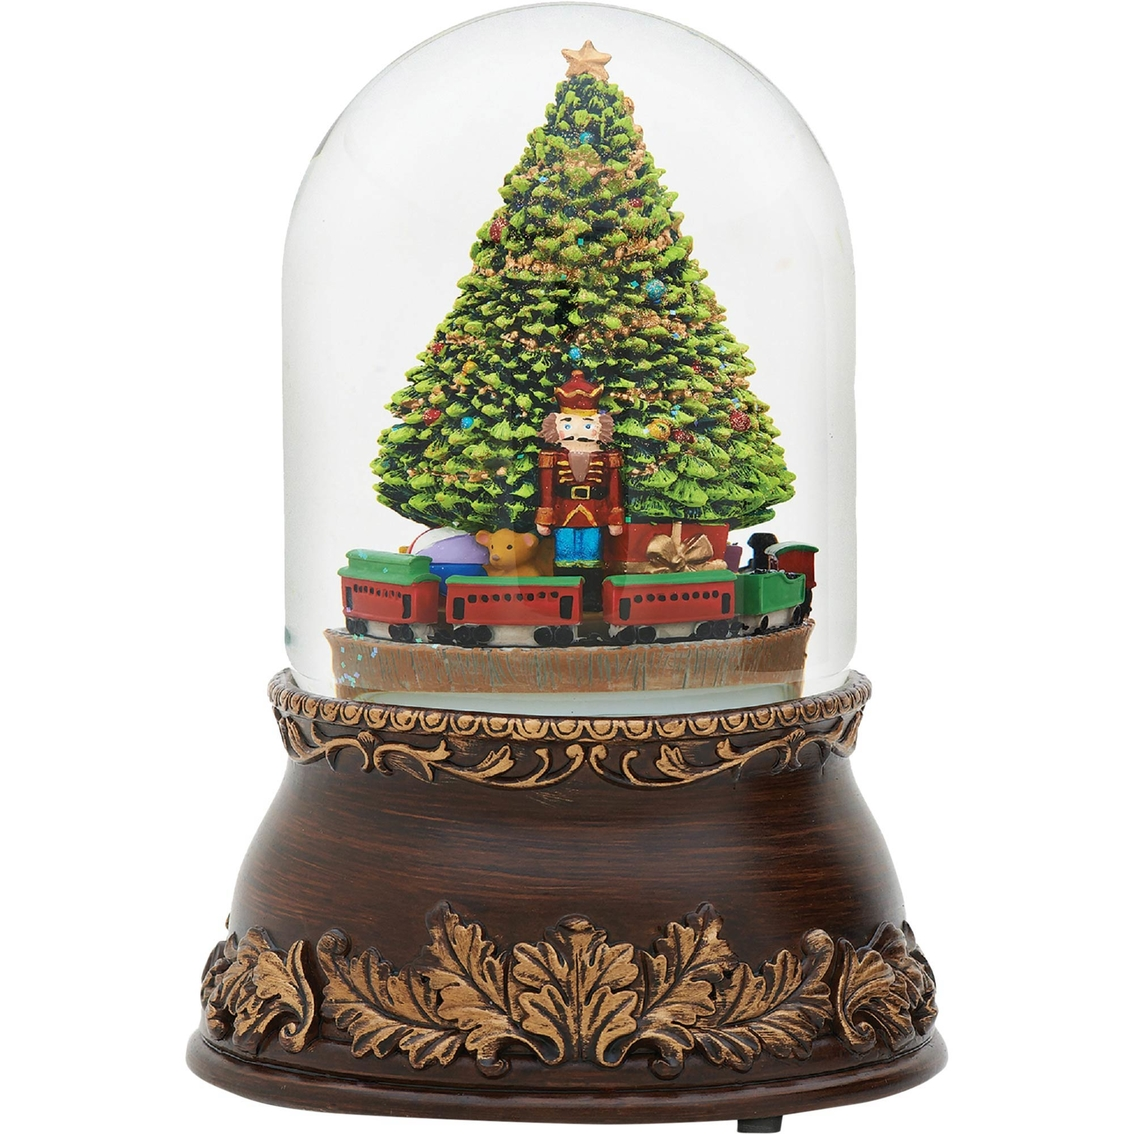 Roman Glitterdome Musical Revolving Christmas Tree And Train | Music ...